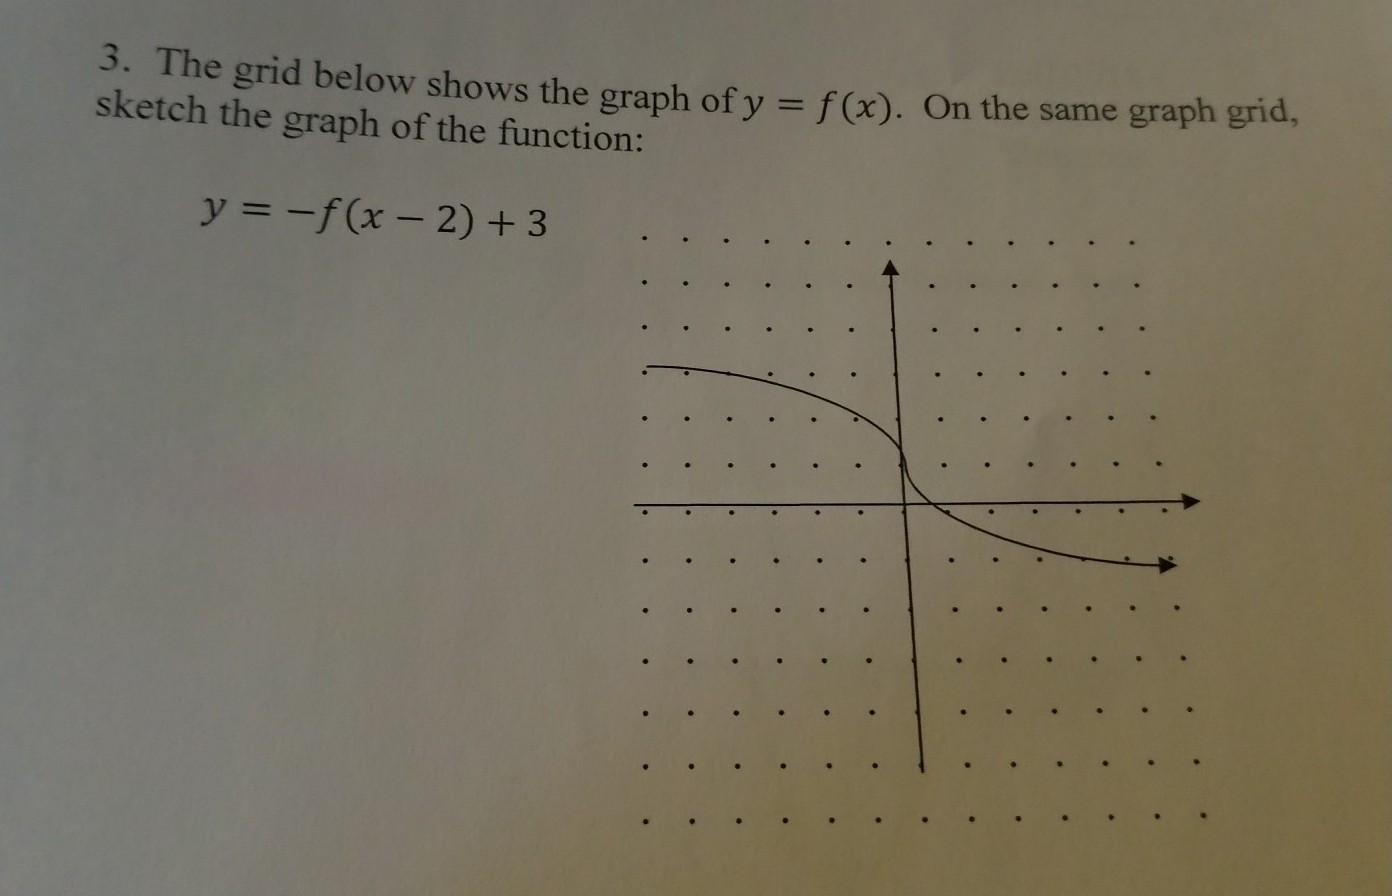 i need help with my algebra homework